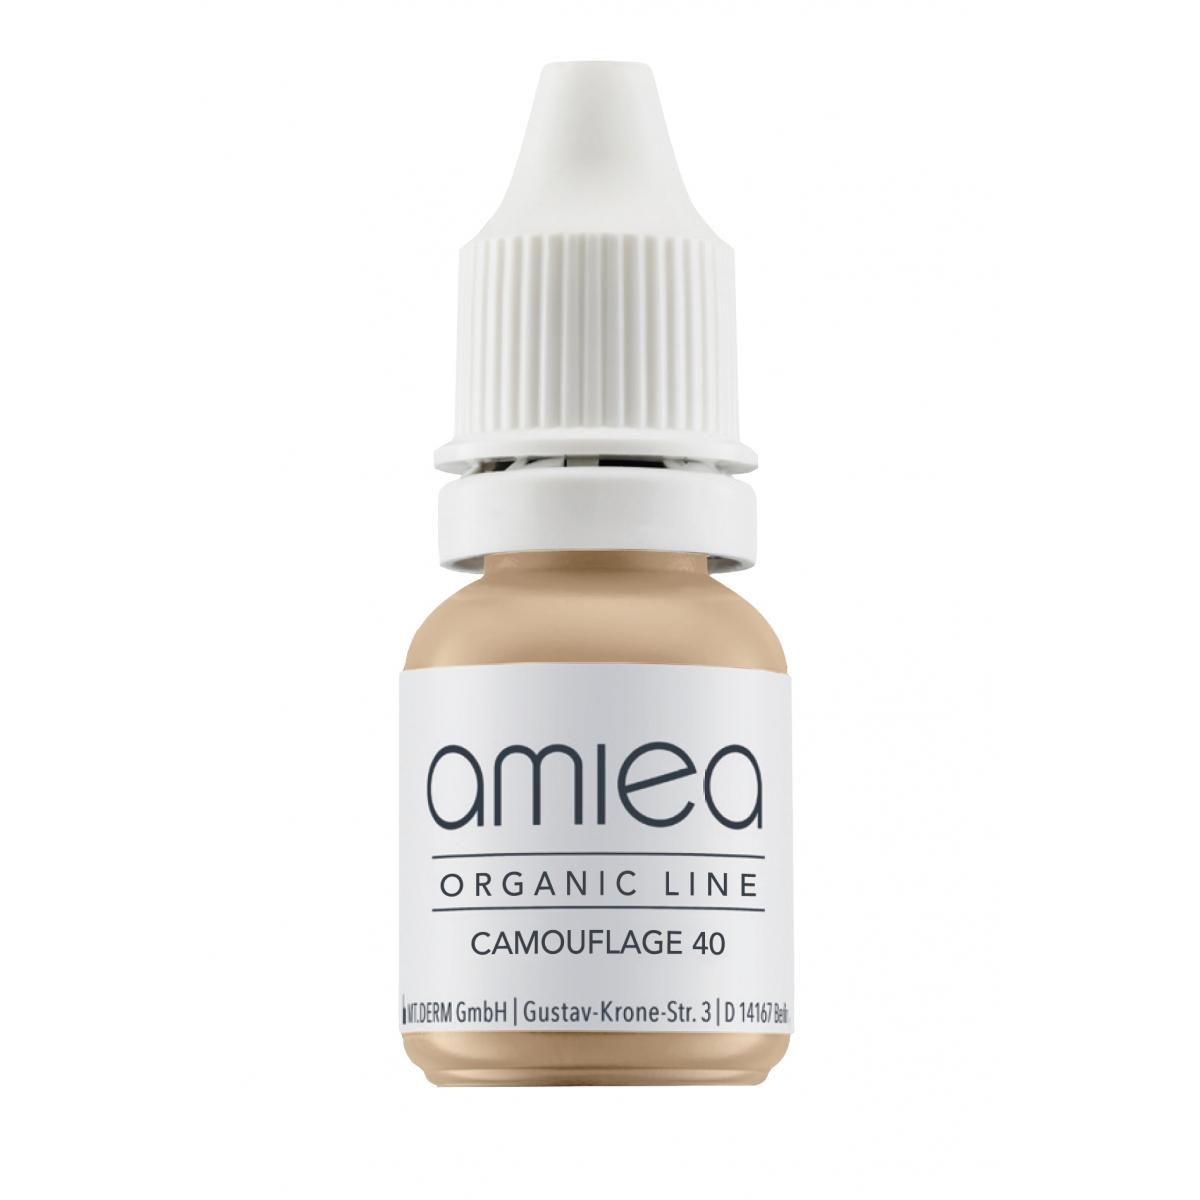 Organicline (5 ml)  - PIGMENTS AMIEA ORGANICLINE CAMOUFLAGE 40, Flacon 5 ml